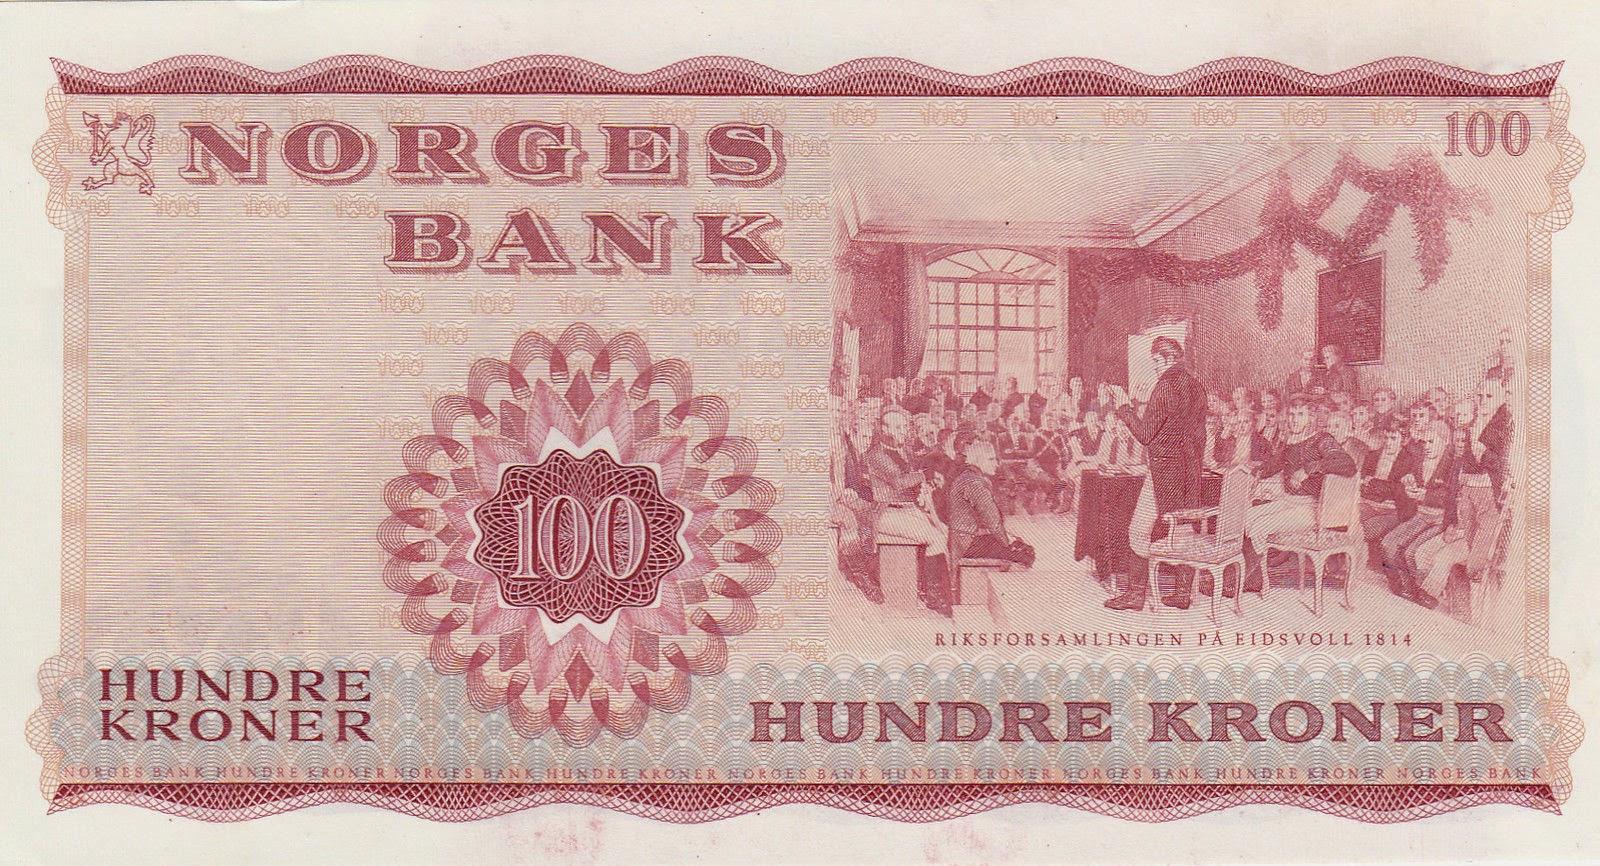 Norway Banknotes 100 Kroner bank note 1974